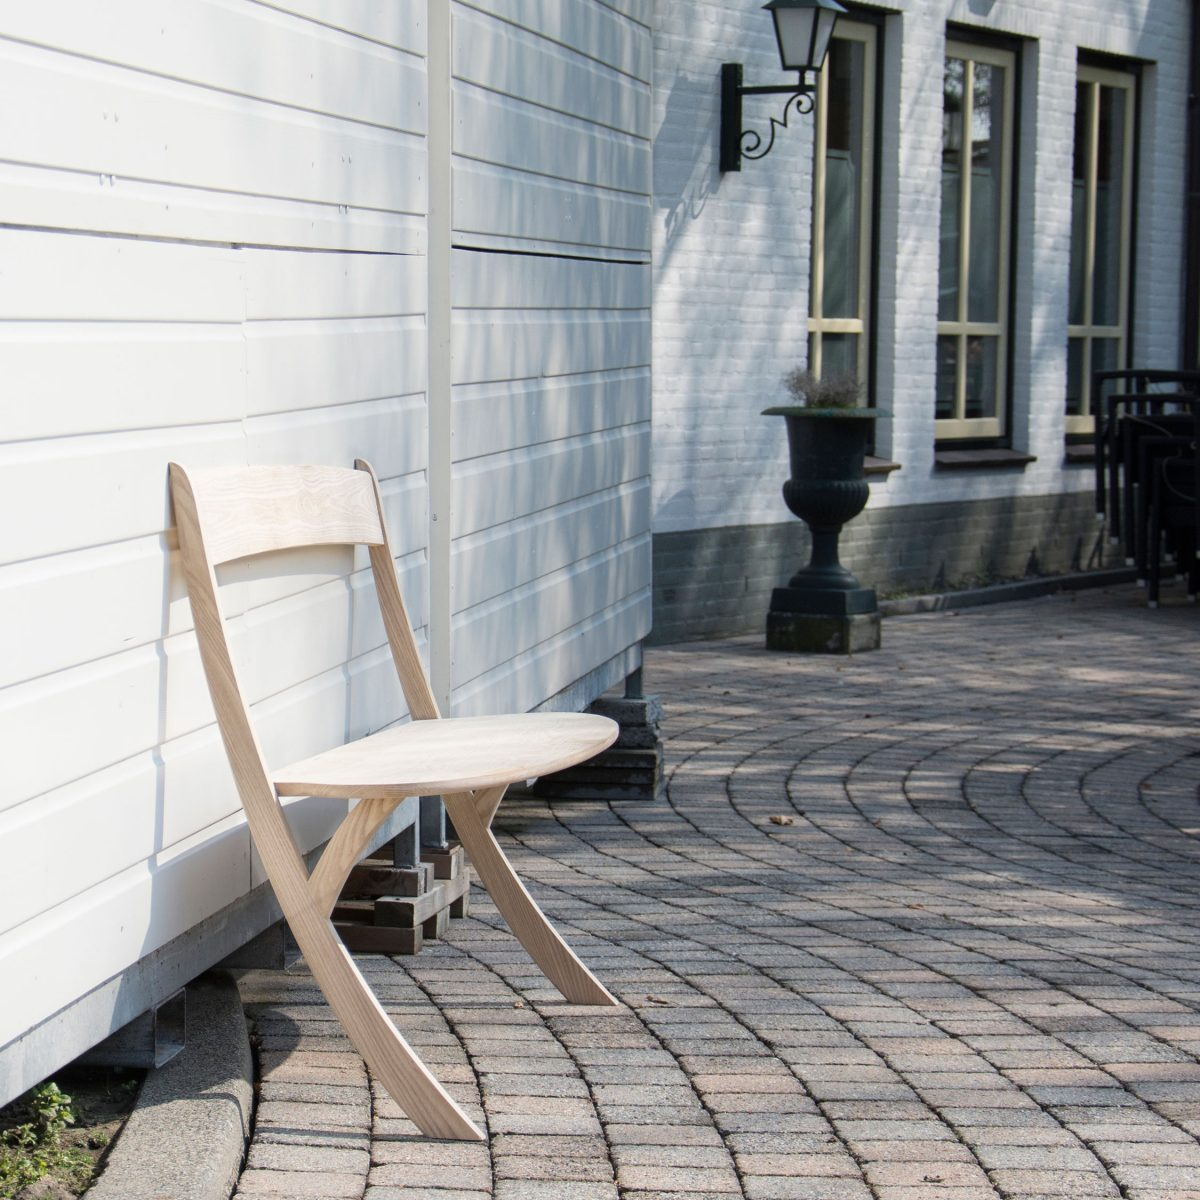 Leaning Bench van Izabela Boloz – gimmii shop